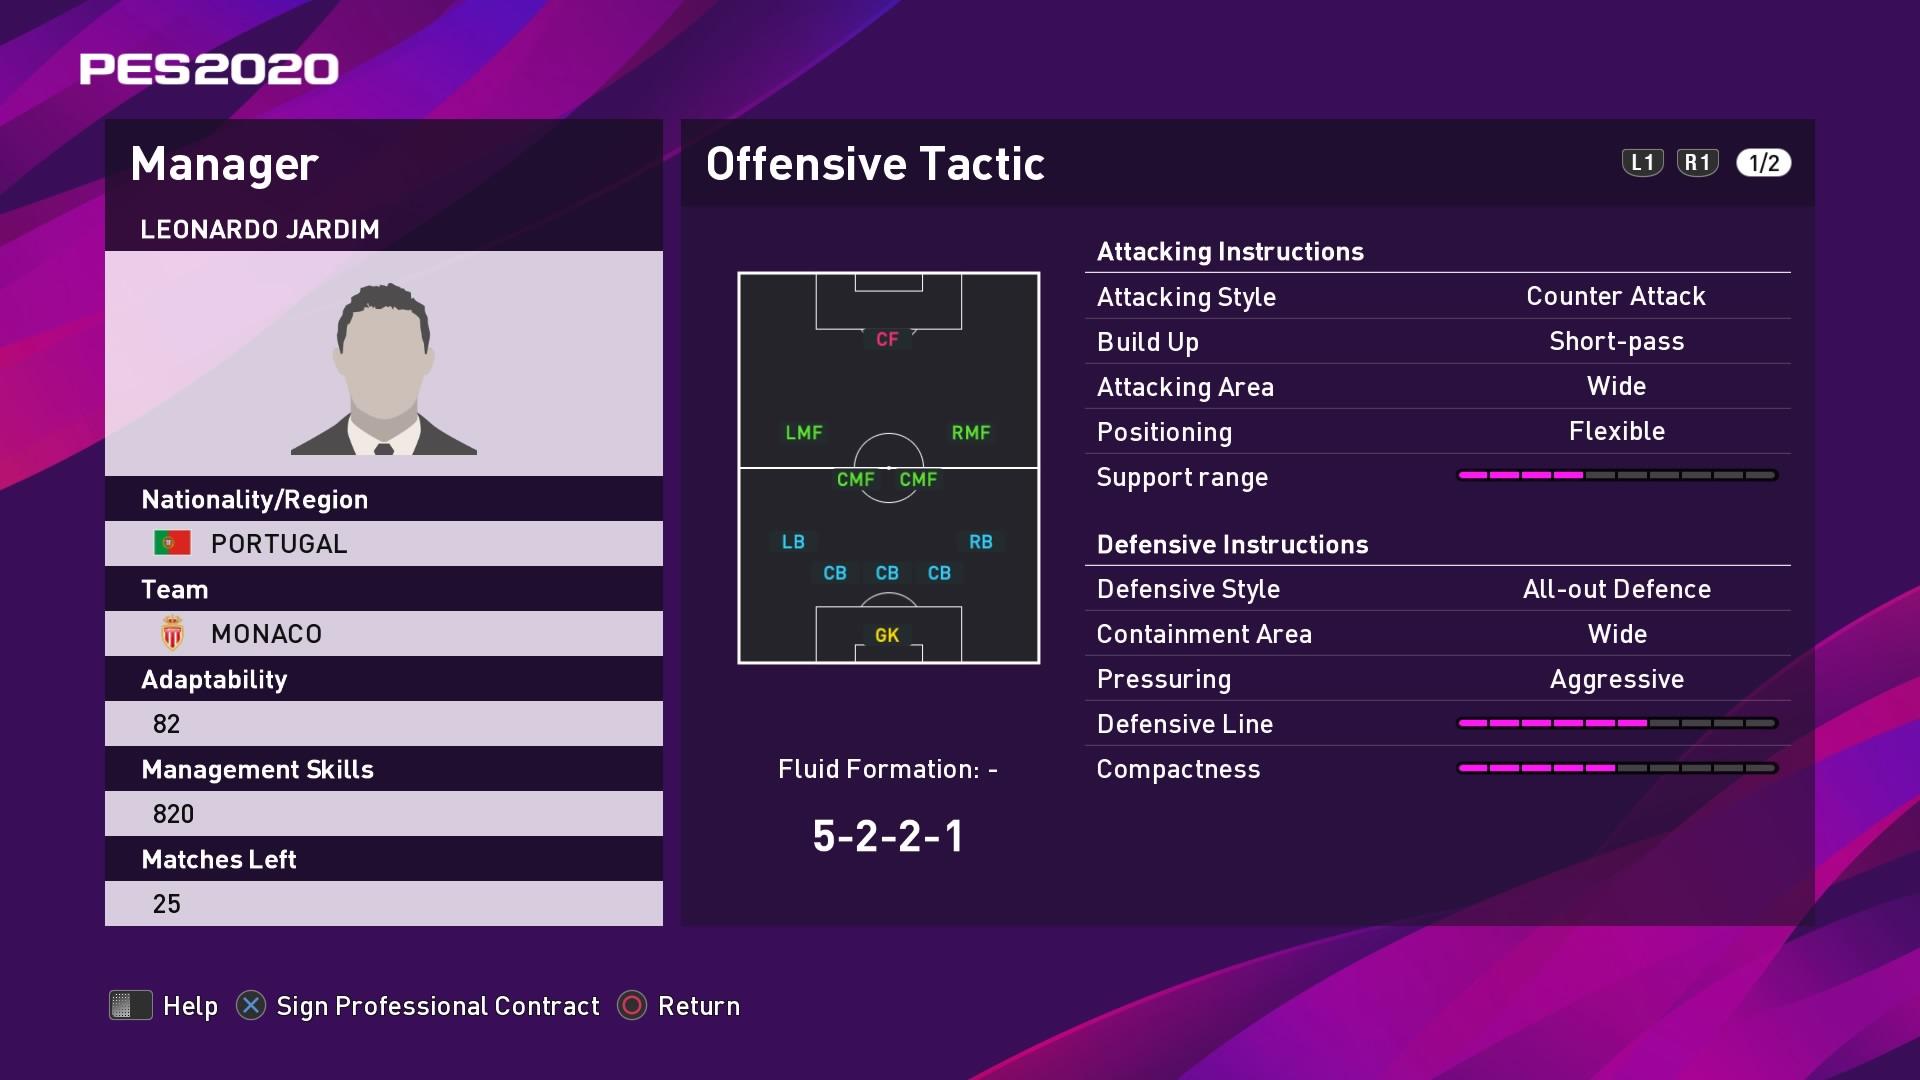 Leonardo Jardim (2) Offensive Tactic in PES 2020 myClub